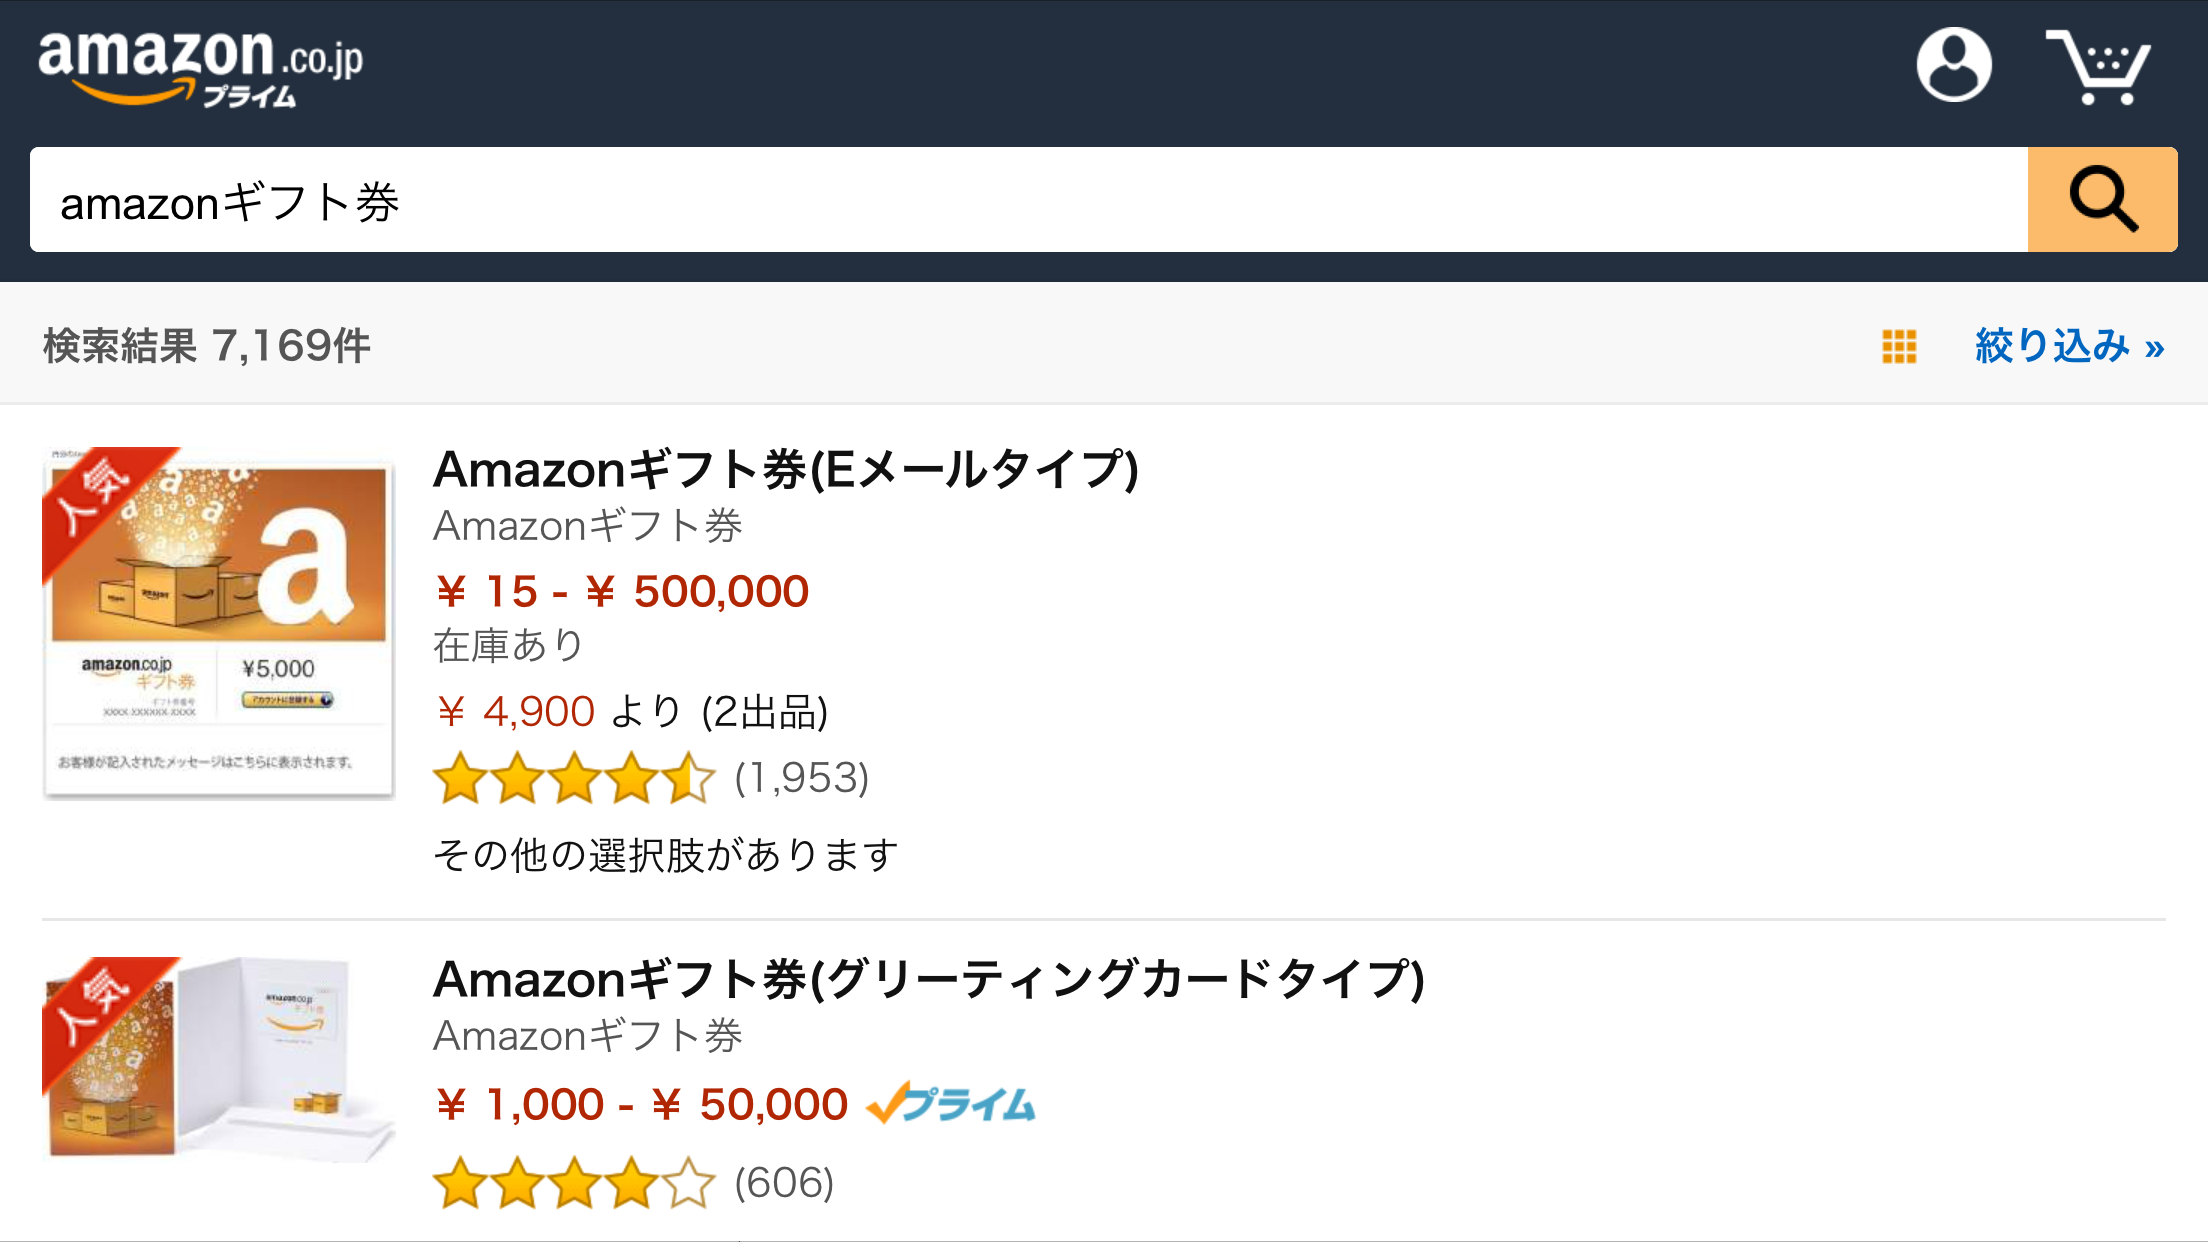 amazonギフト券Eメールタイプ購入手順